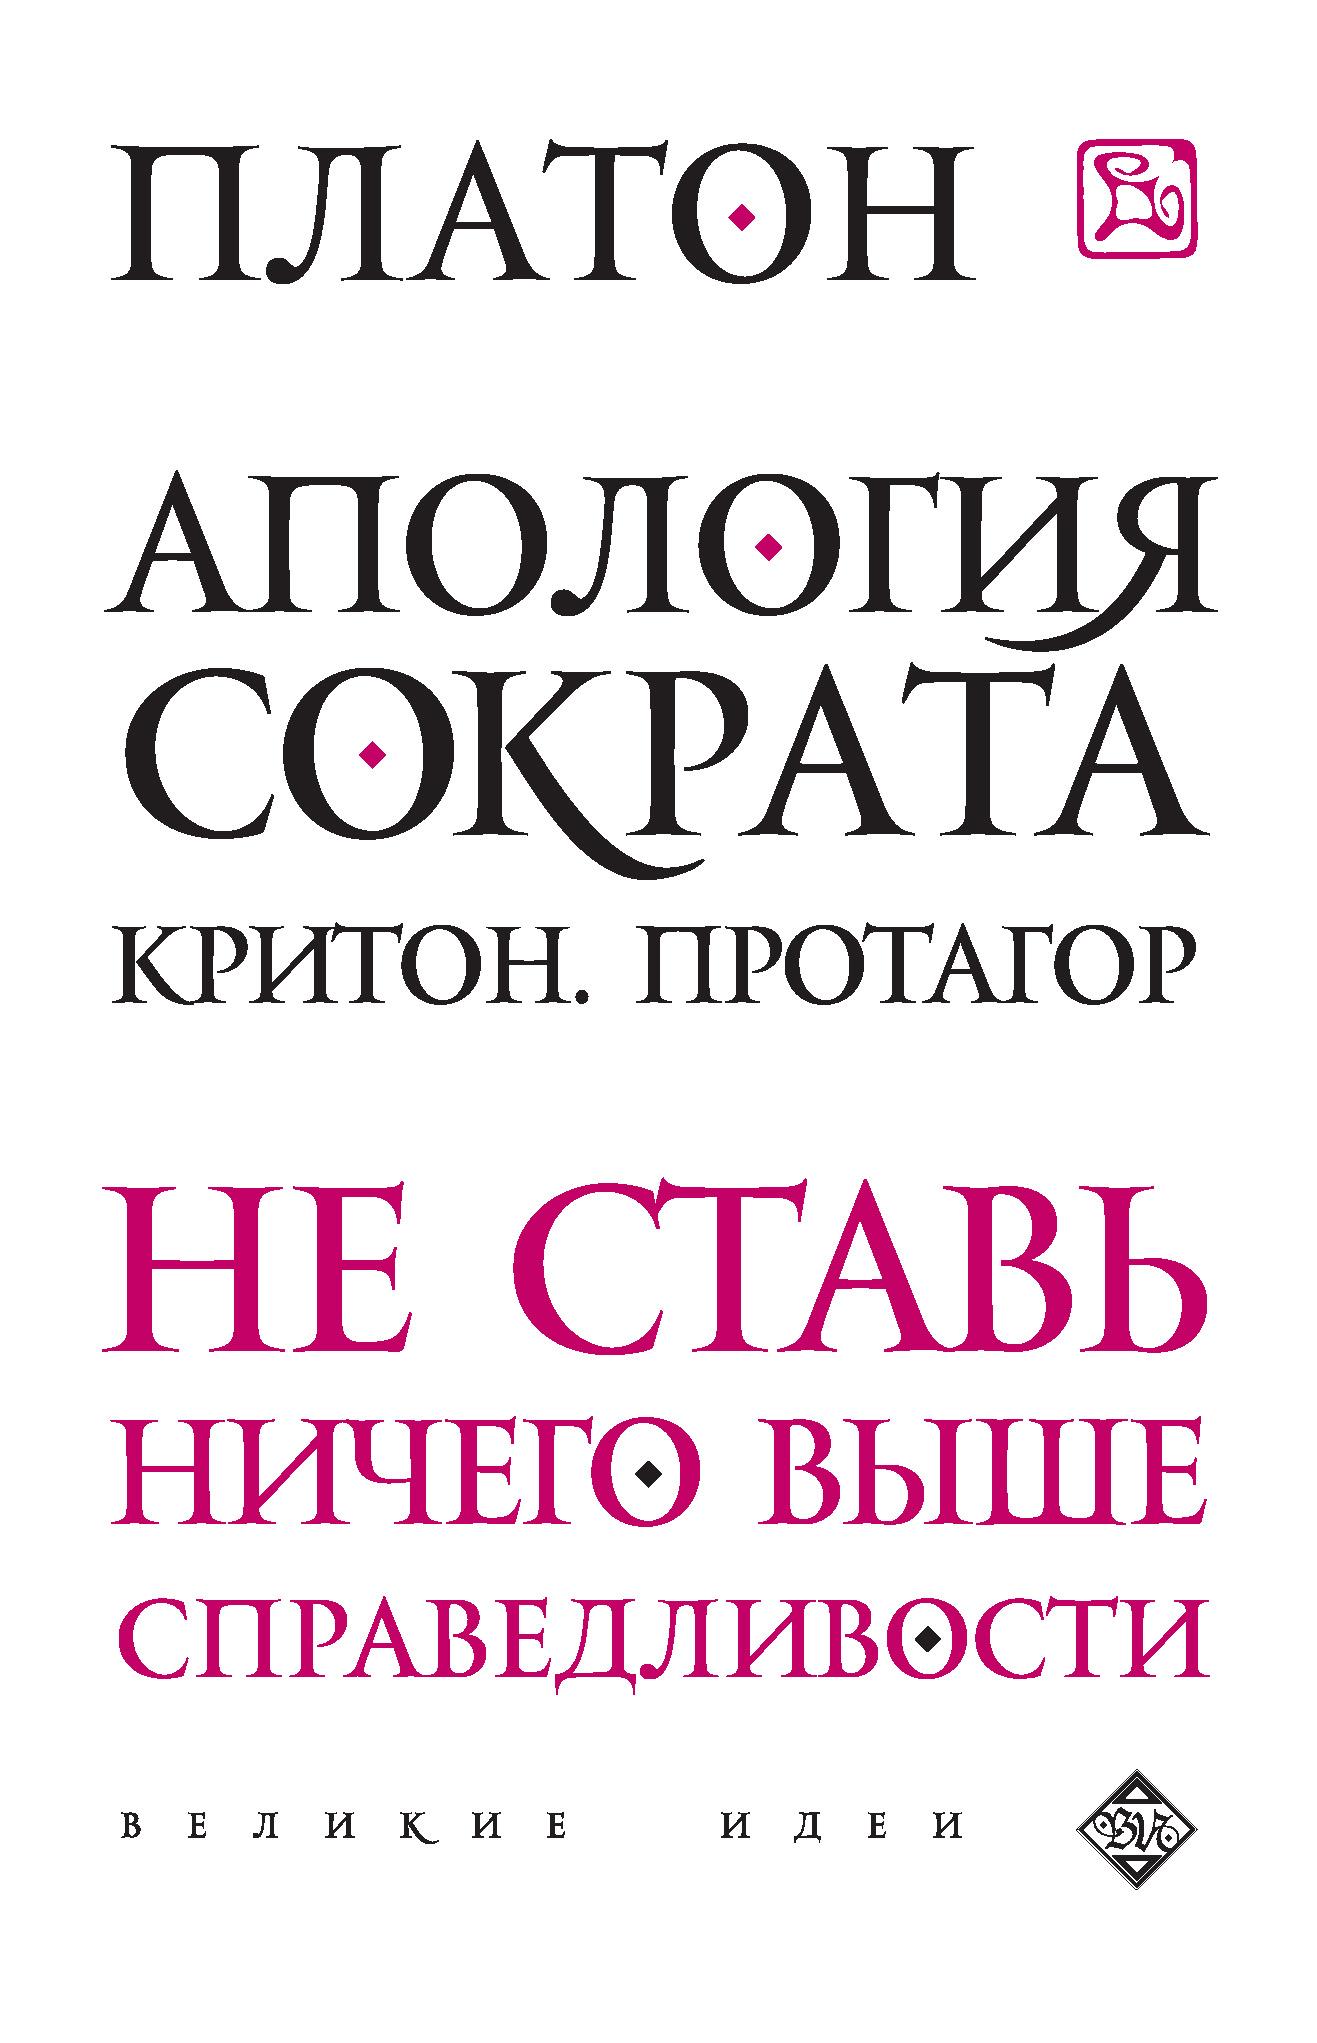 Платон Апология Сократа. Критон. Протагор (сборник) цена 2017